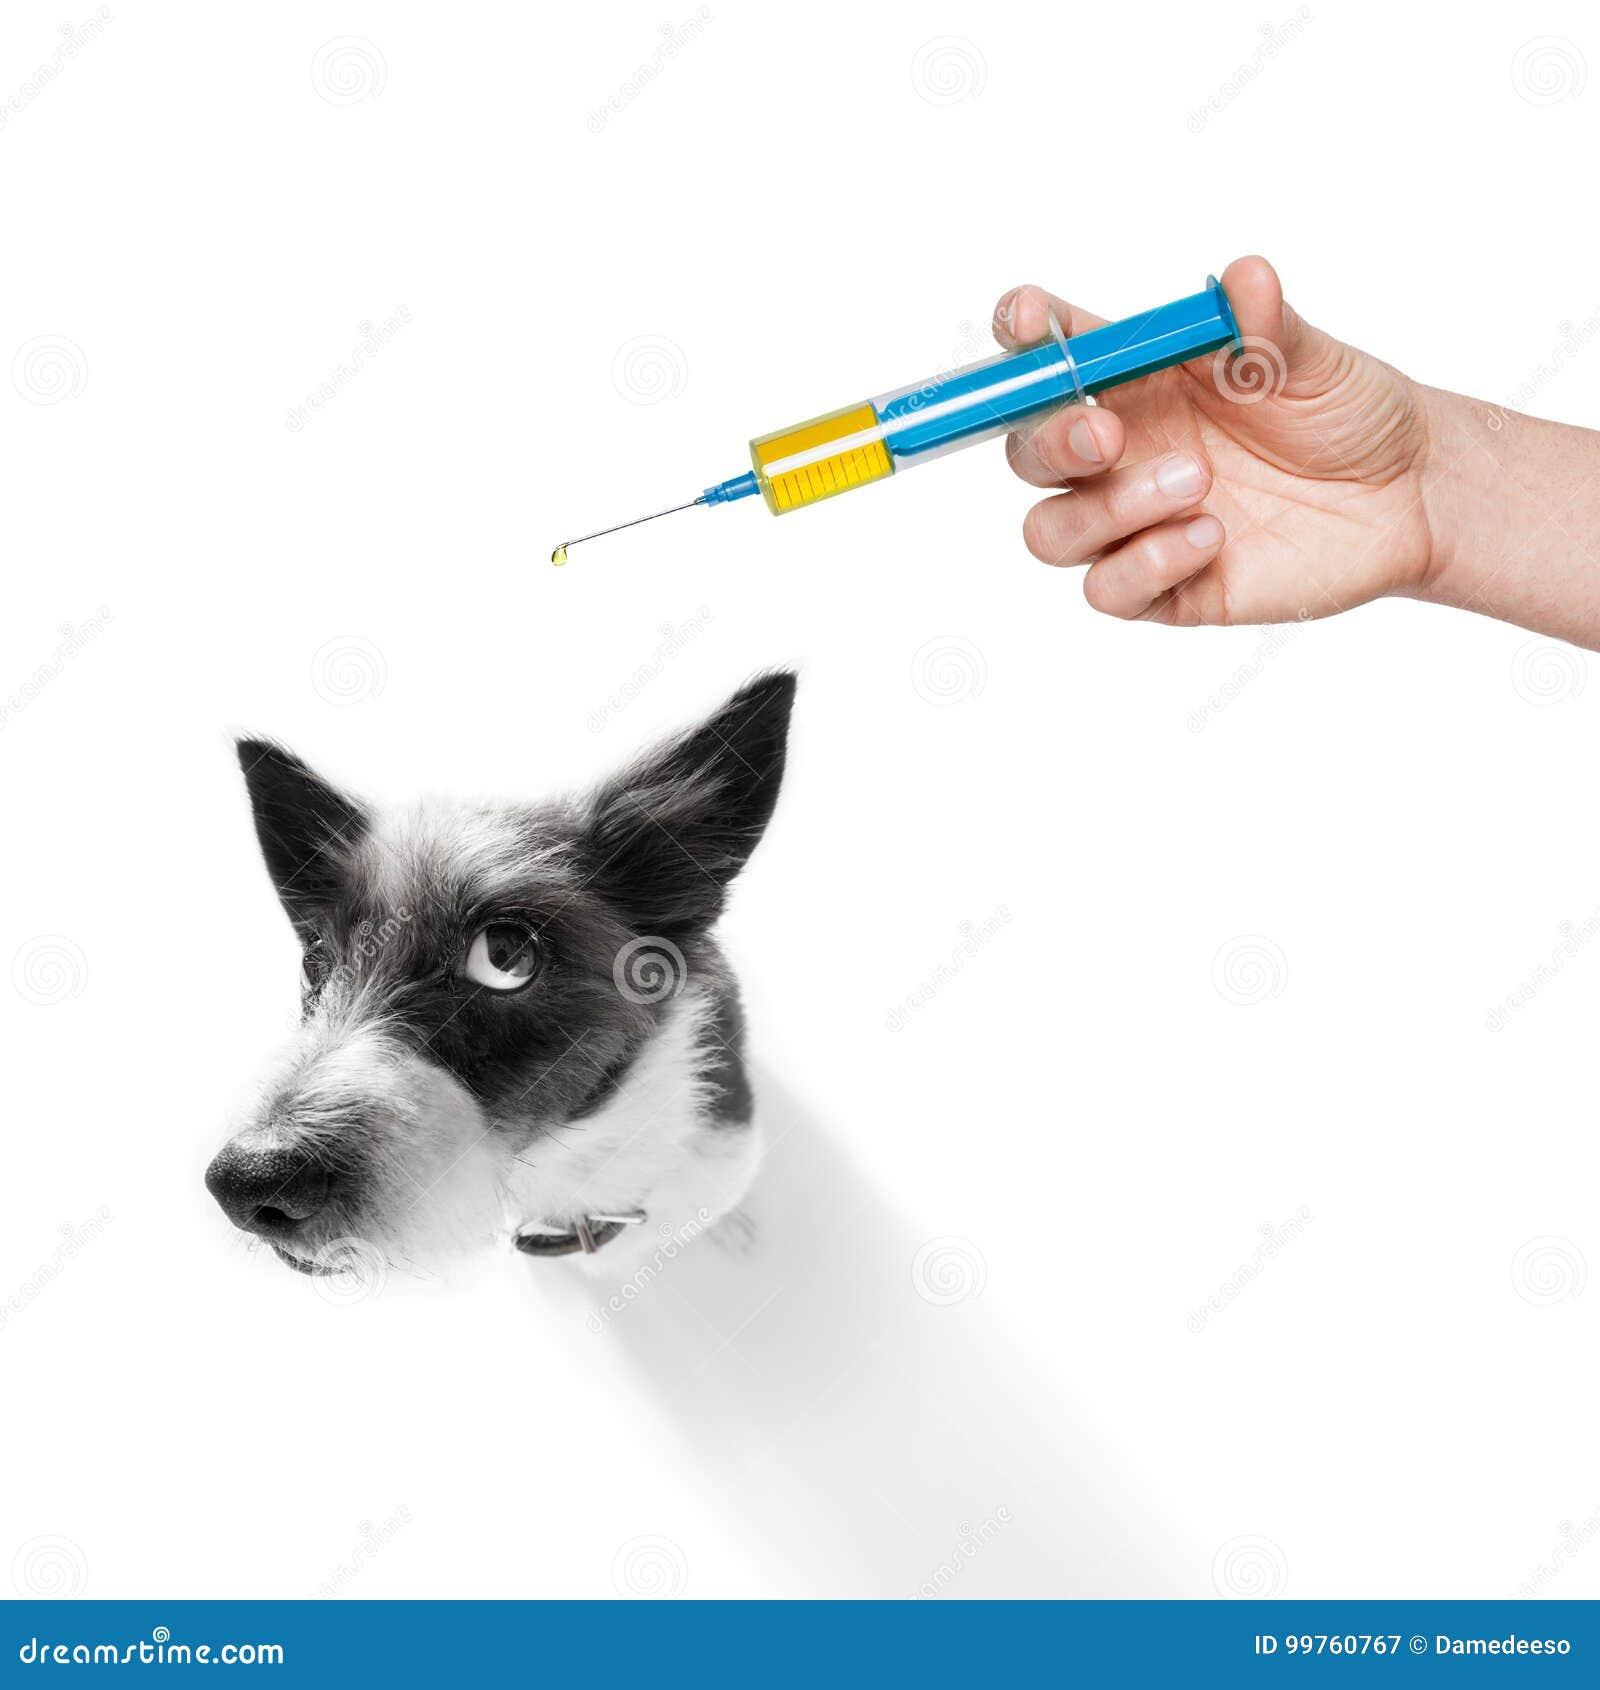 Dog and vaccine syringe